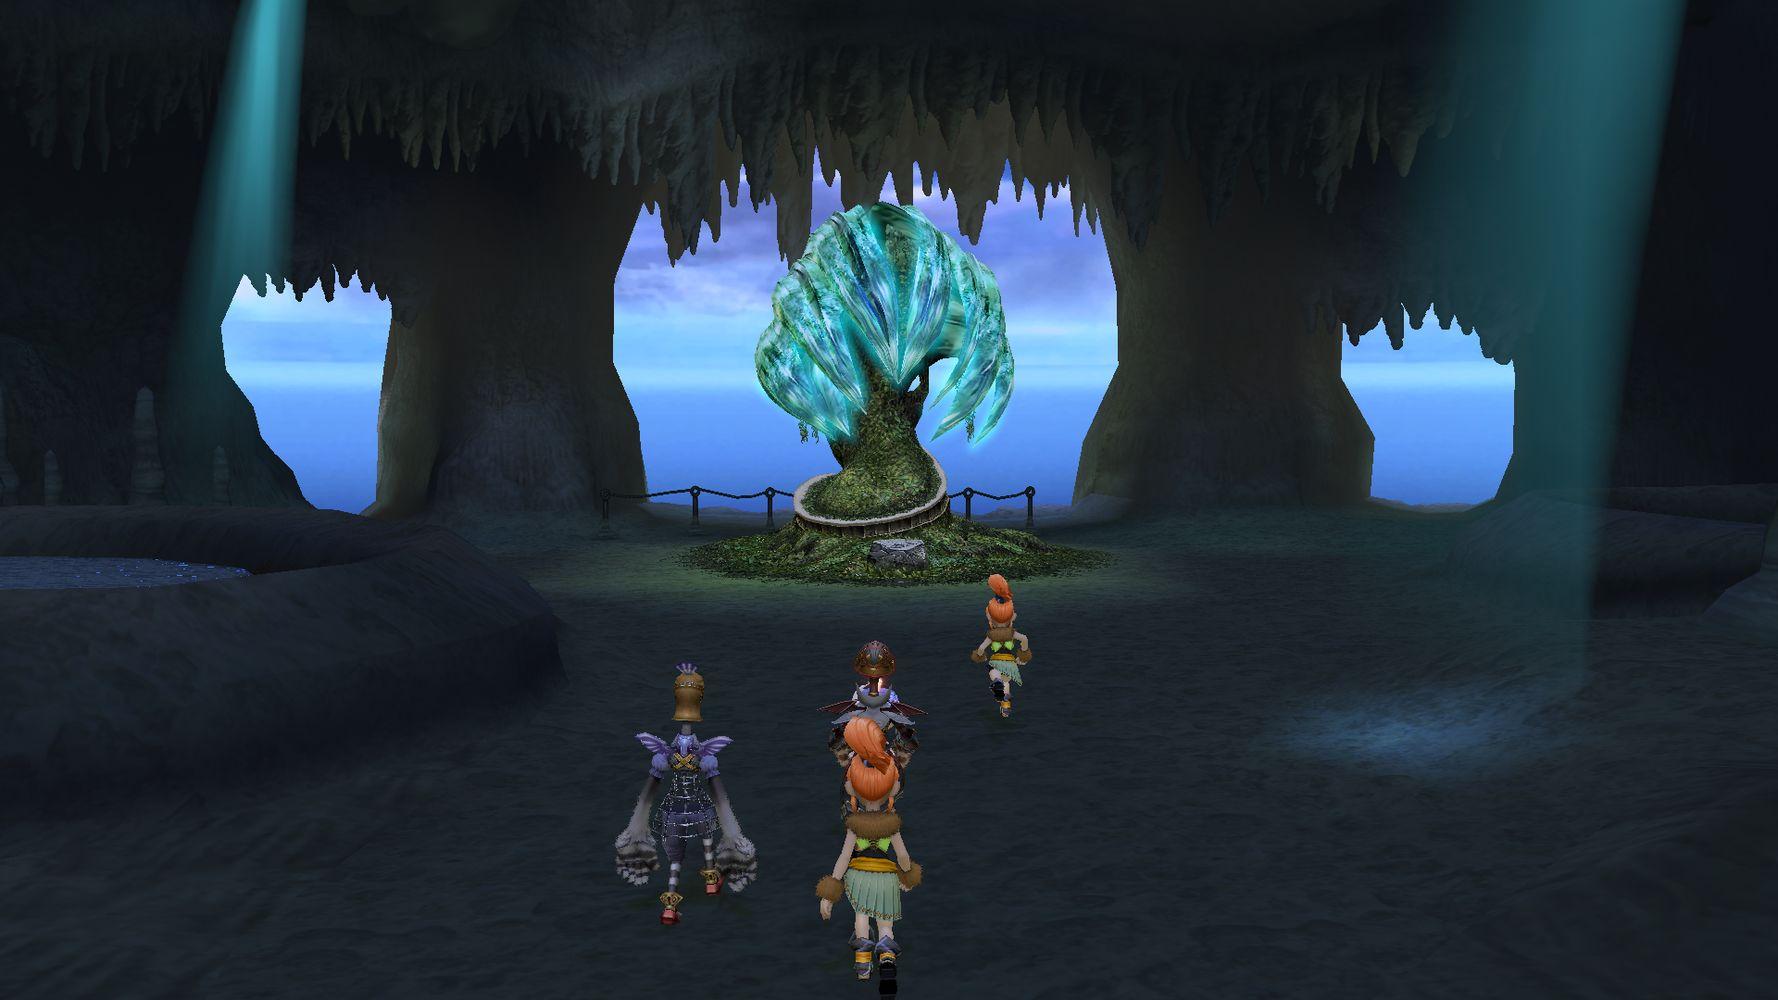 Un gruppo di avventurieri si prepara a raccogliere la Mirra